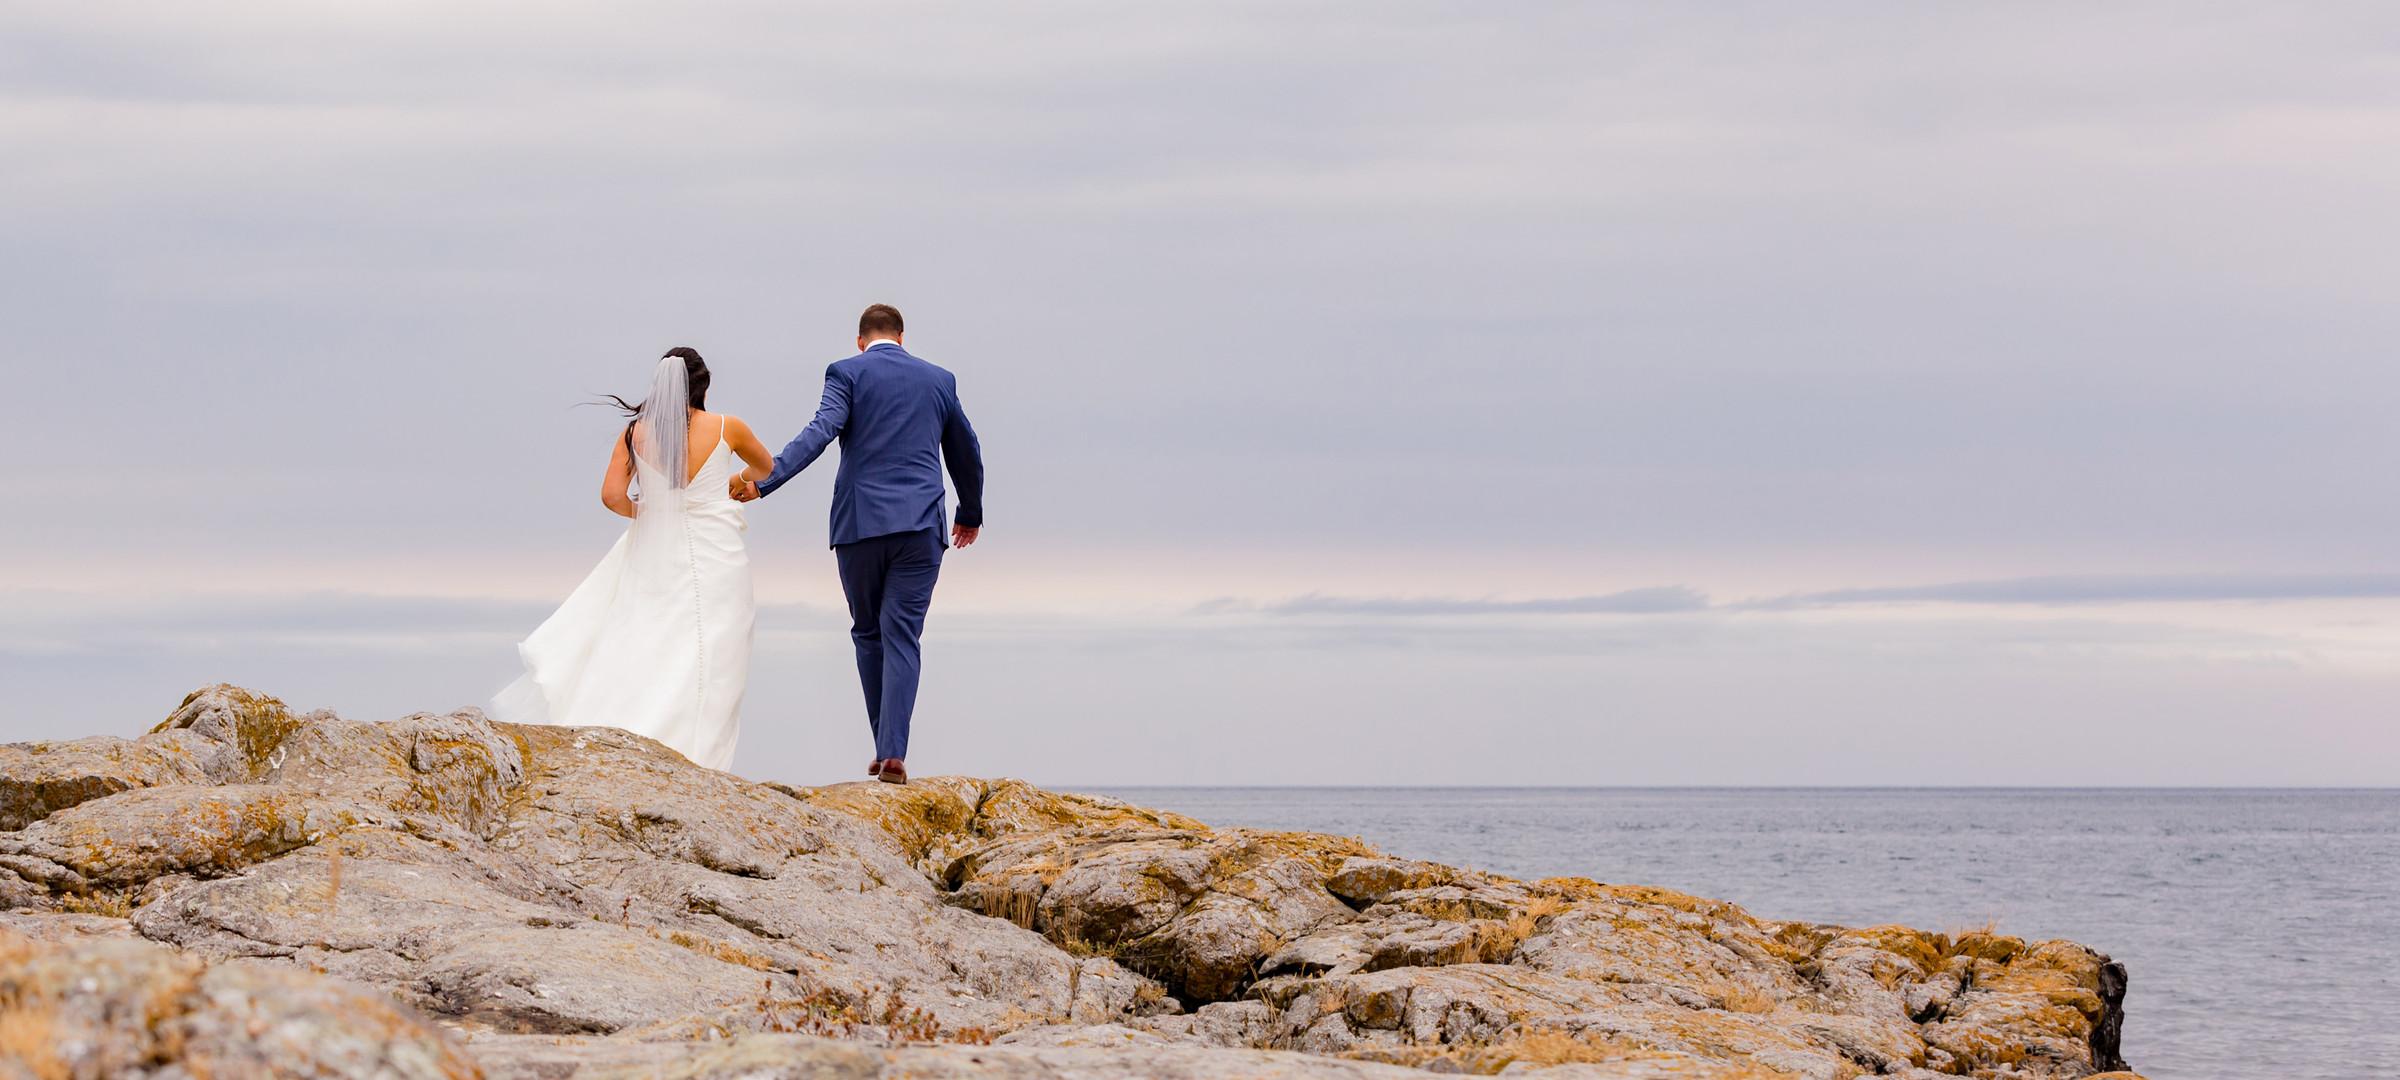 Bride & groom walk towards water